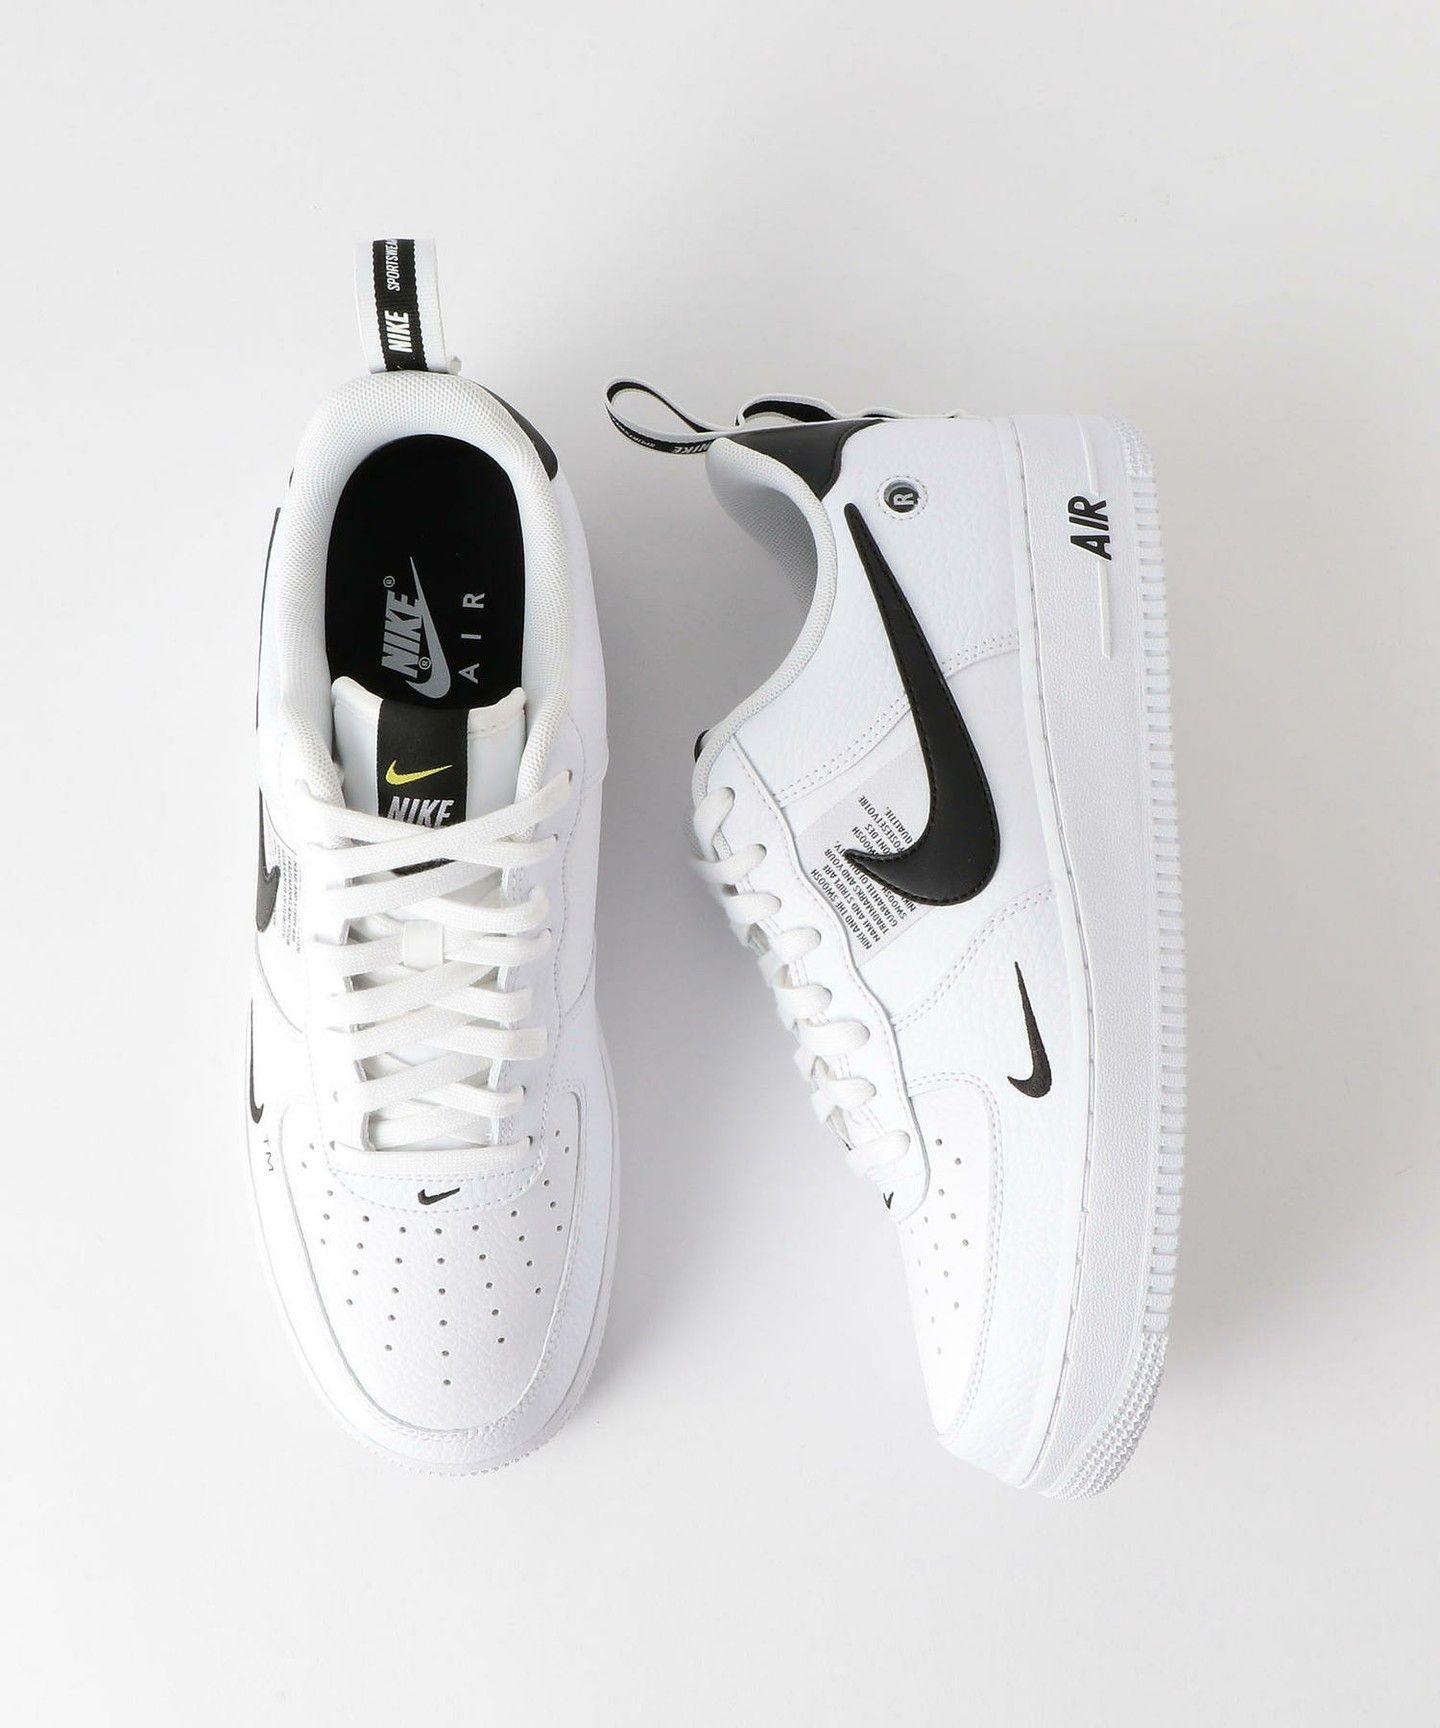 2019 AIR FORCE 1 07 LV8 Utility Scarpe uomo nero bianco scarpe sportive 36,45